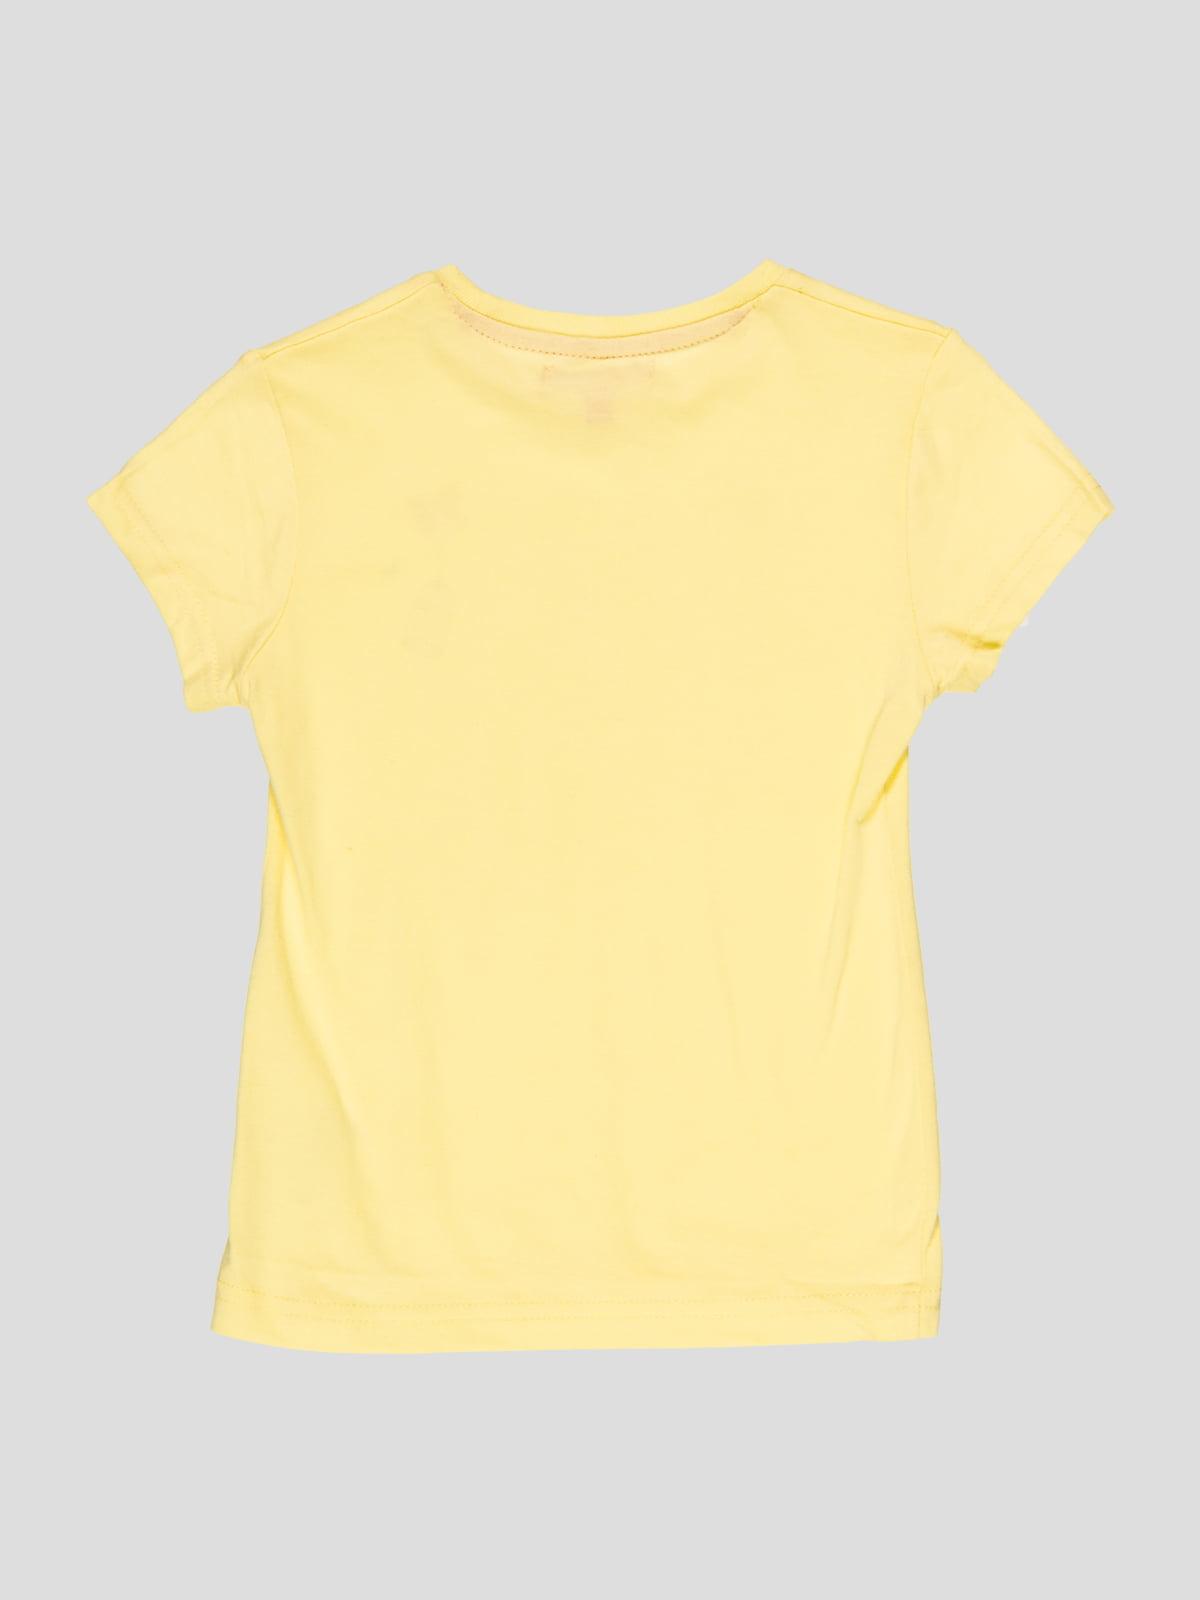 Футболка жовта з принтом | 4854812 | фото 2